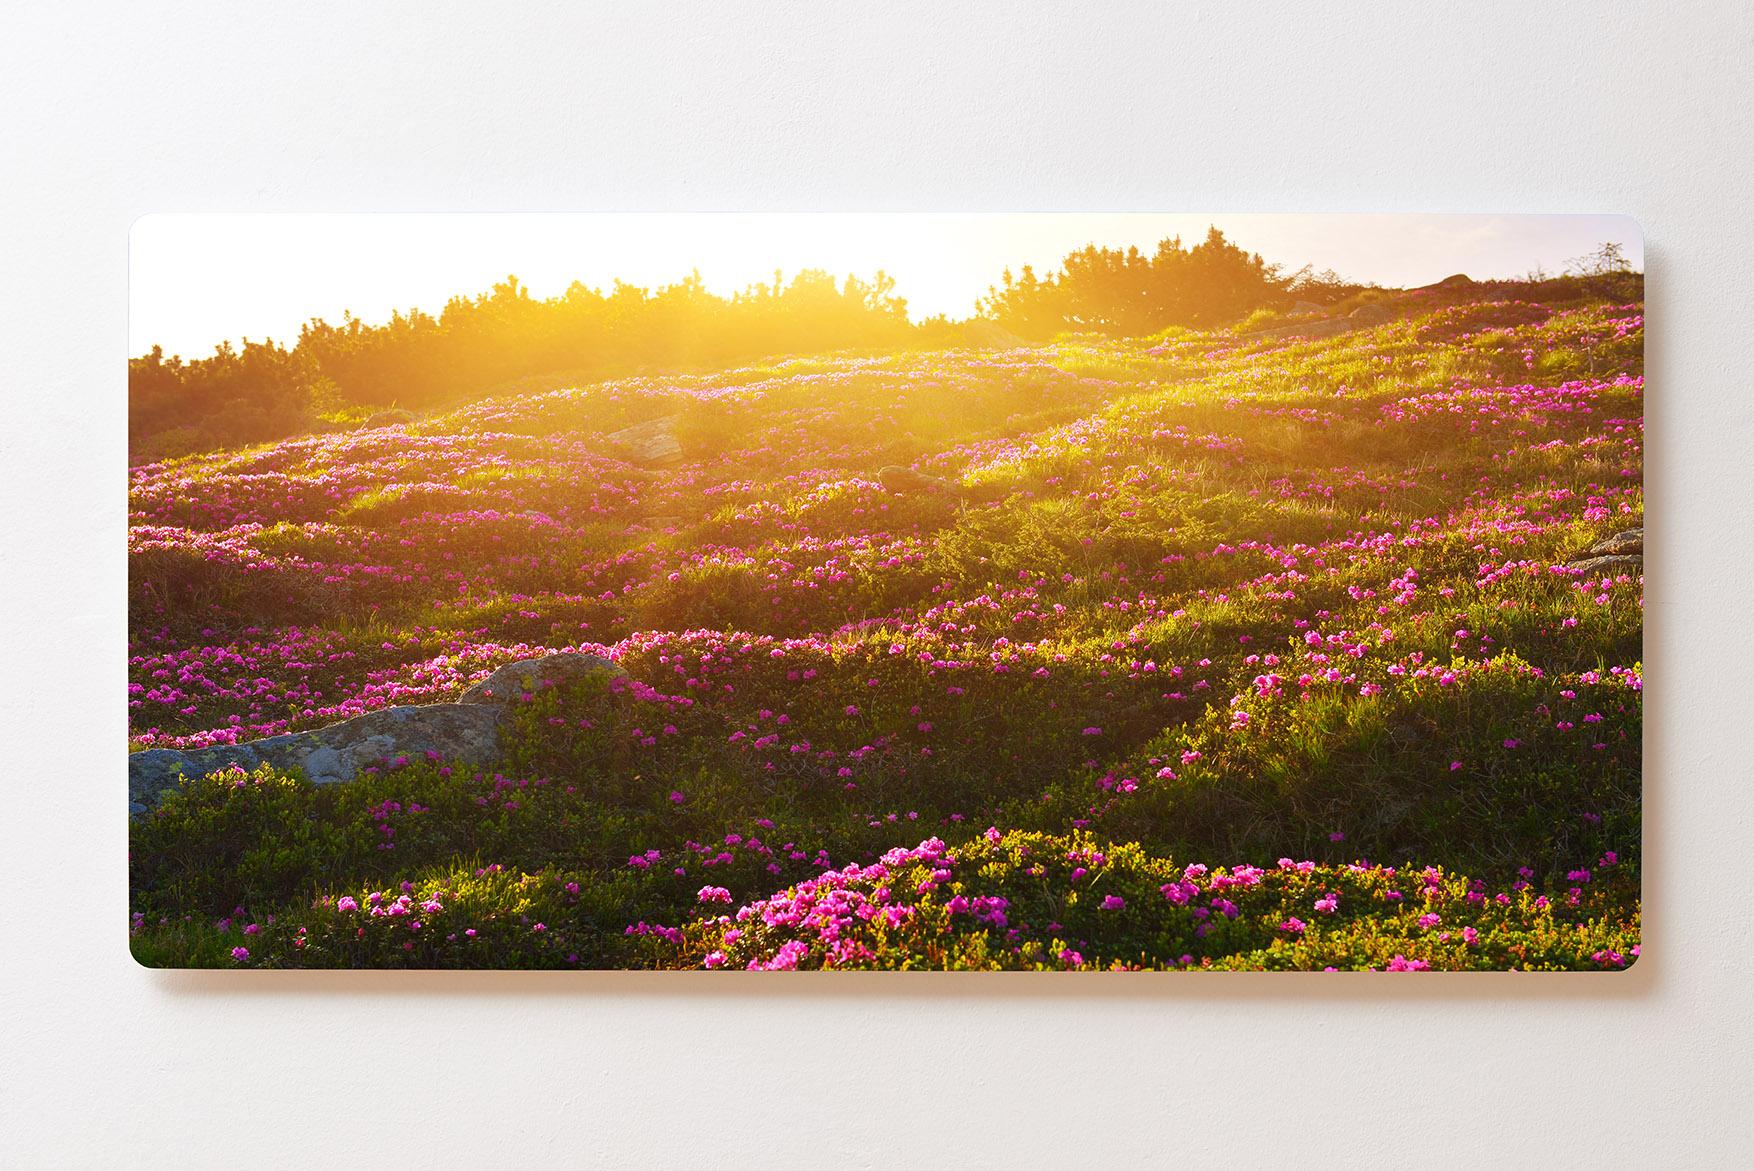 Magnettafel BACKLIGHT 120x60cm Motiv-Wandbild M142 Wiese Berge Sonnenaufgang